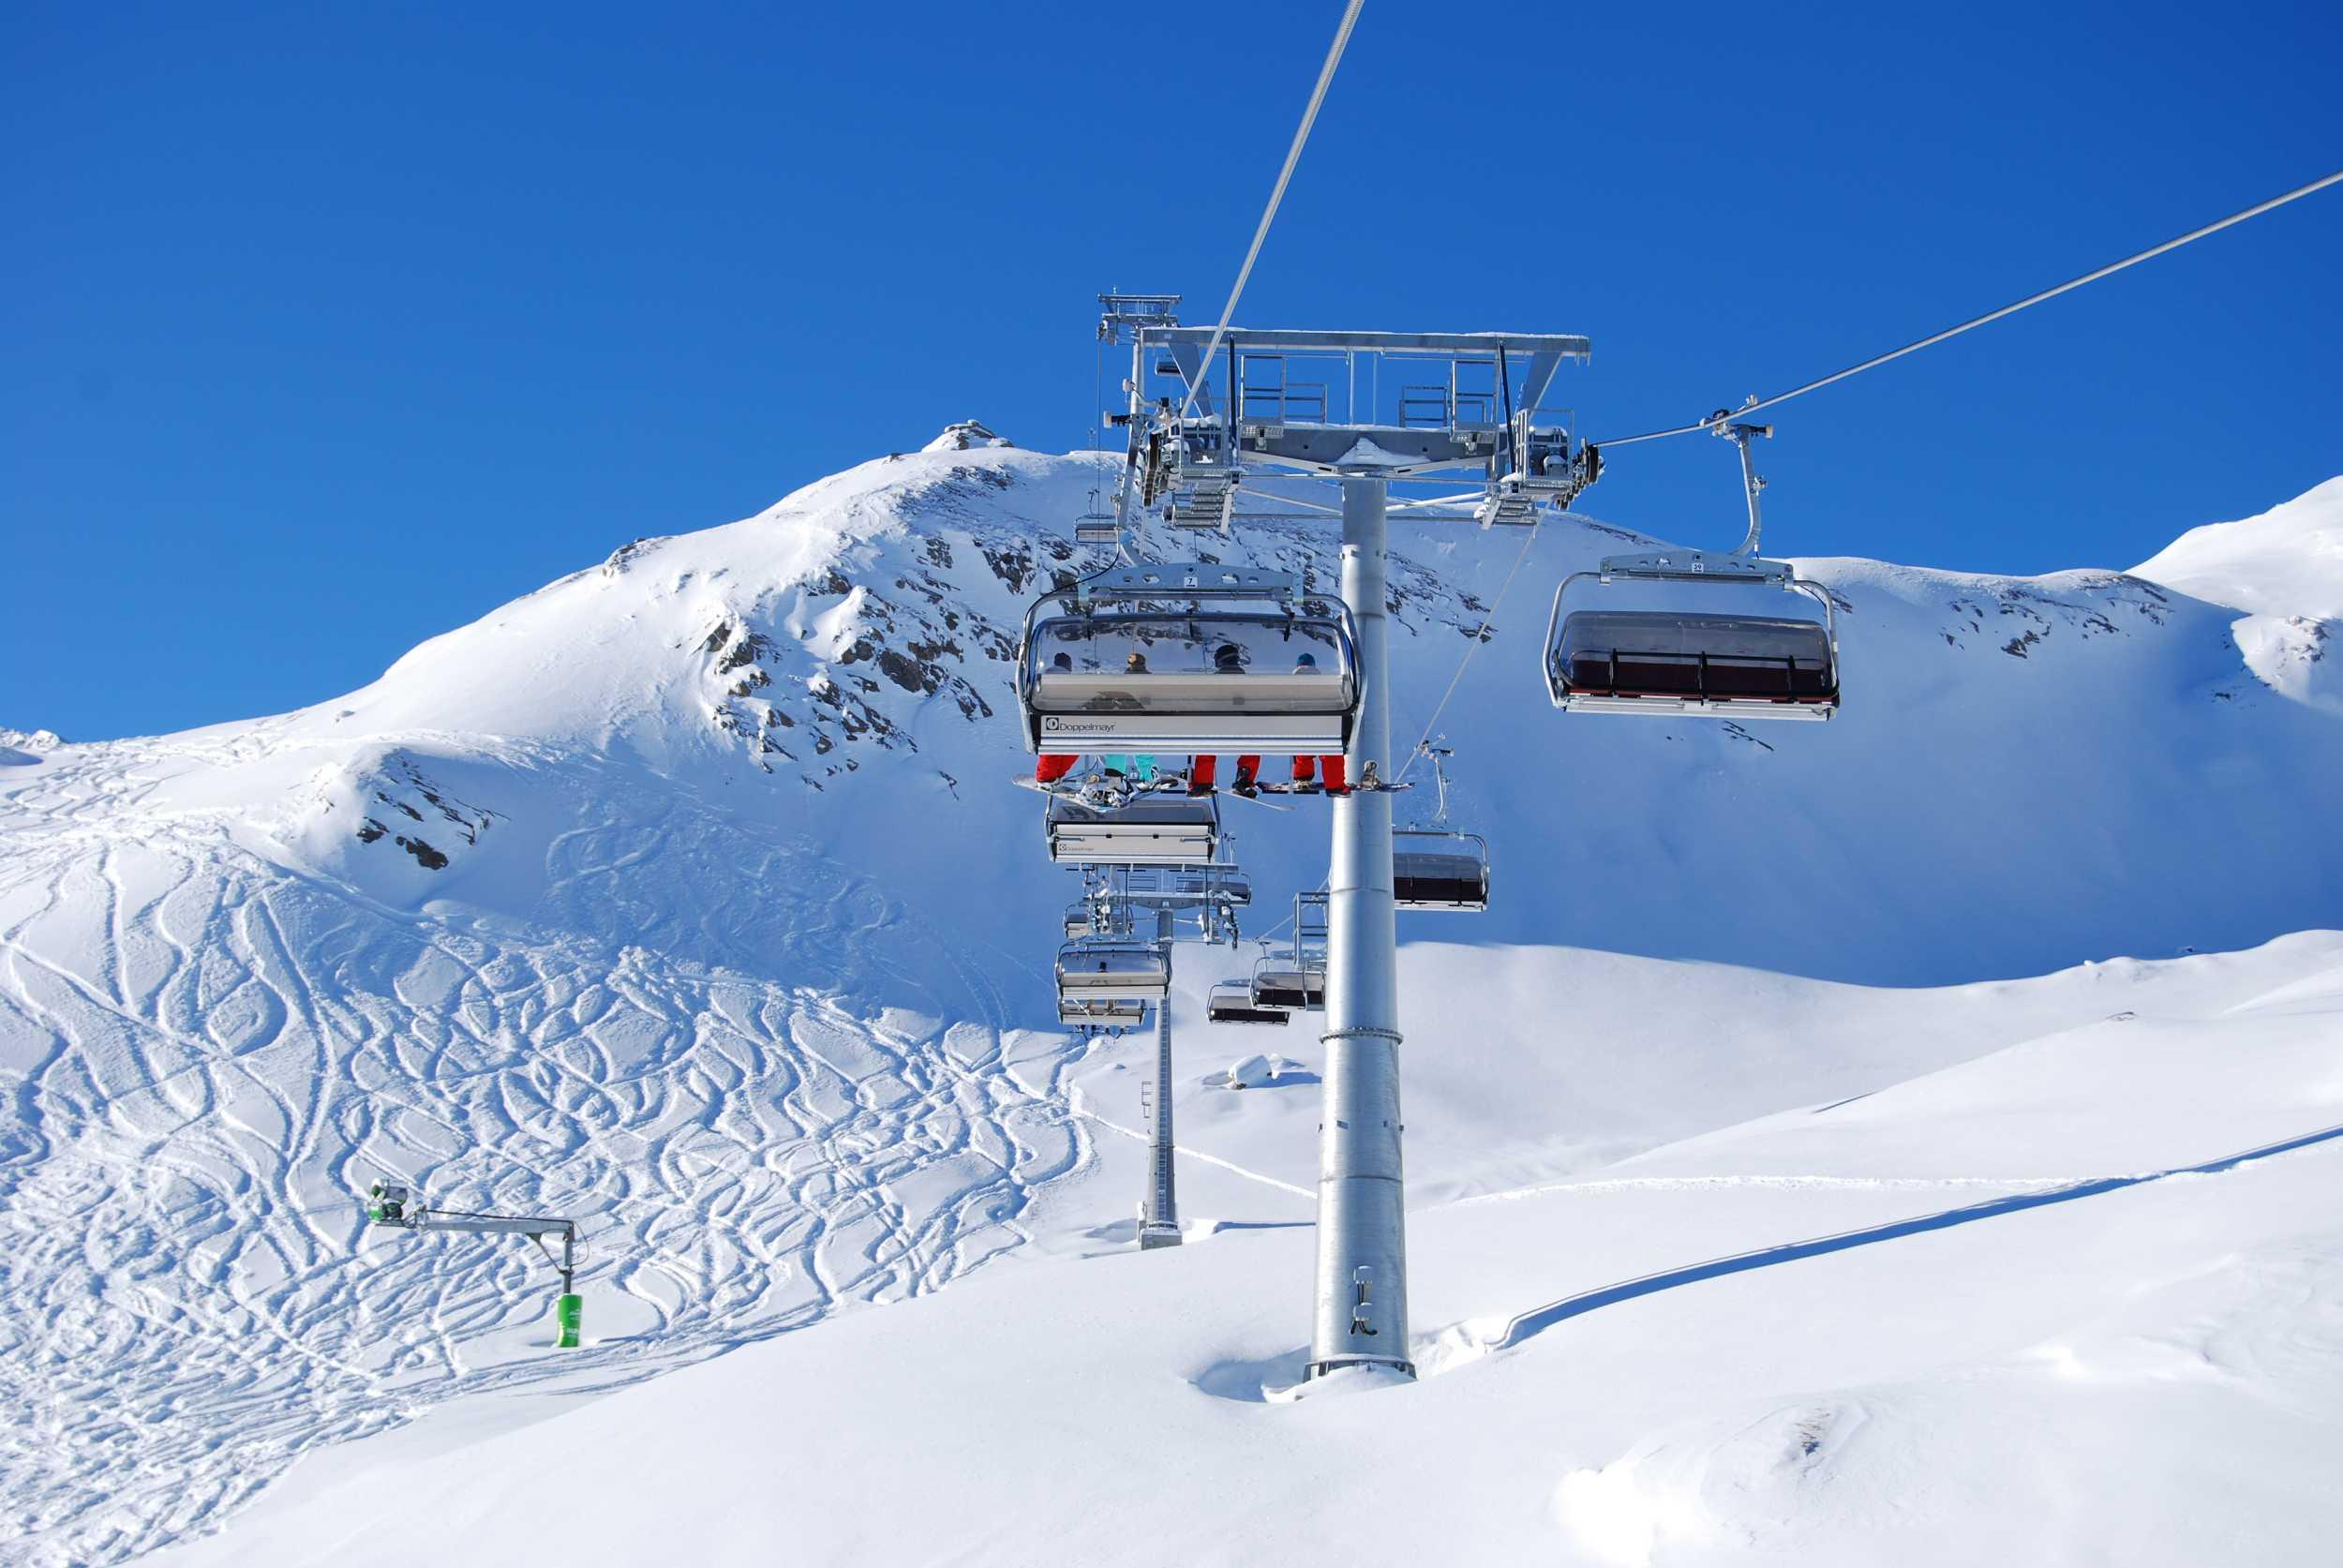 Big snowboard kaprun 6105